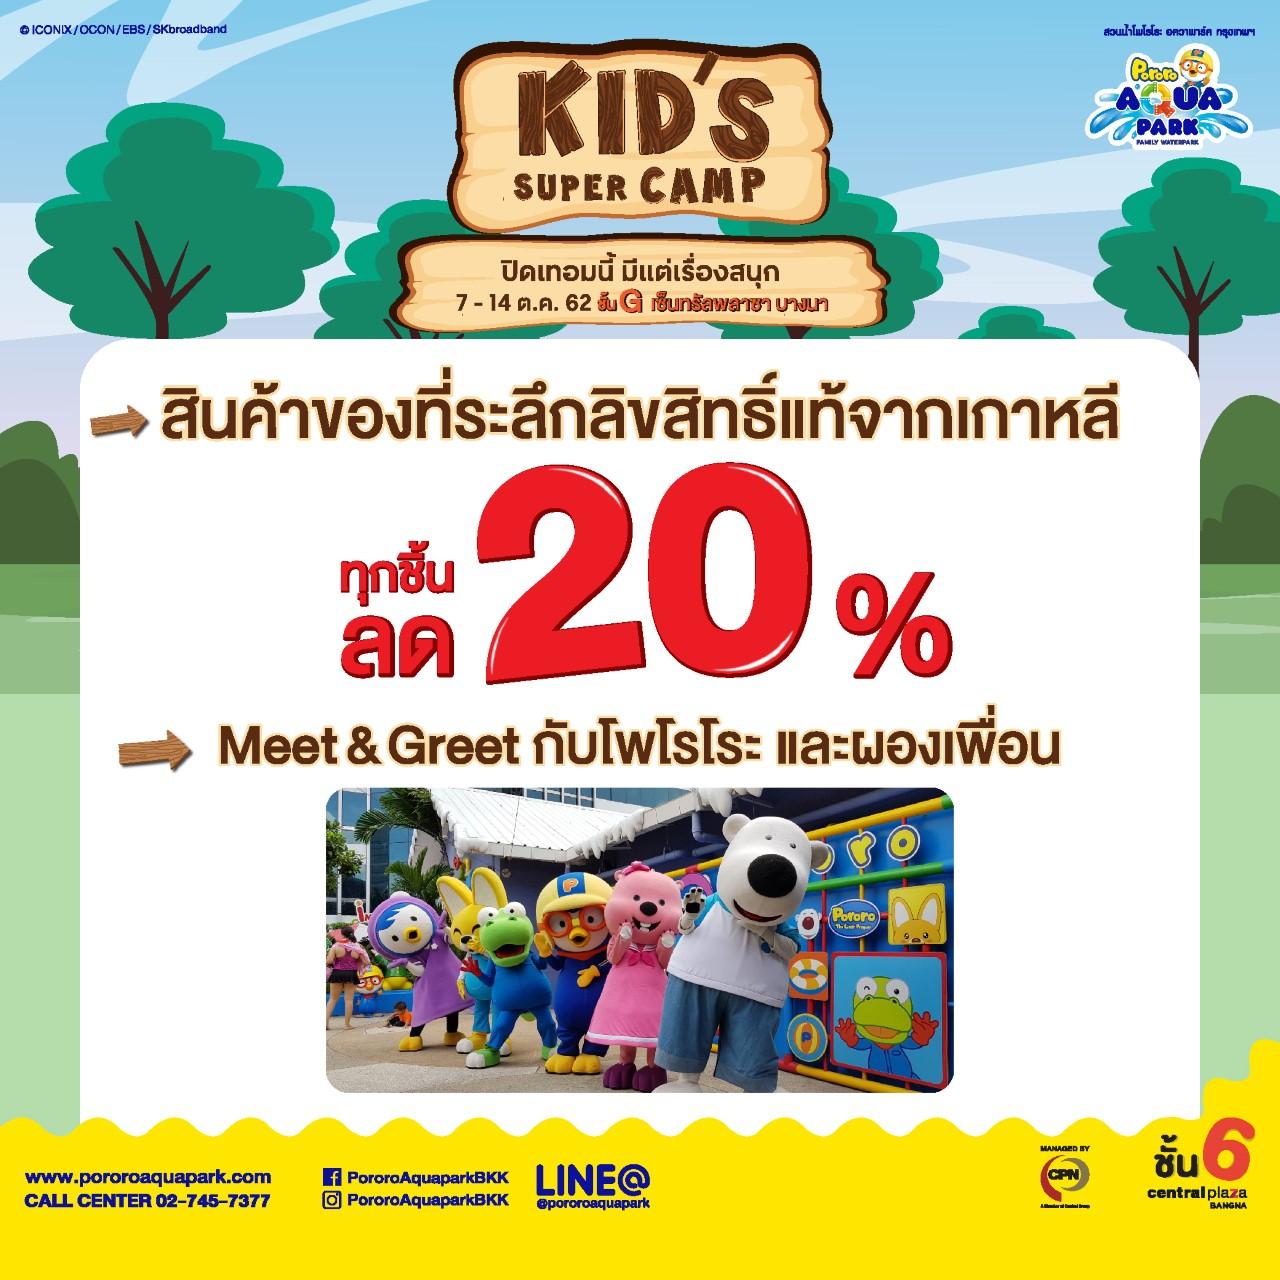 Kid's Super Camp | Pororo AquaPark Bangkok